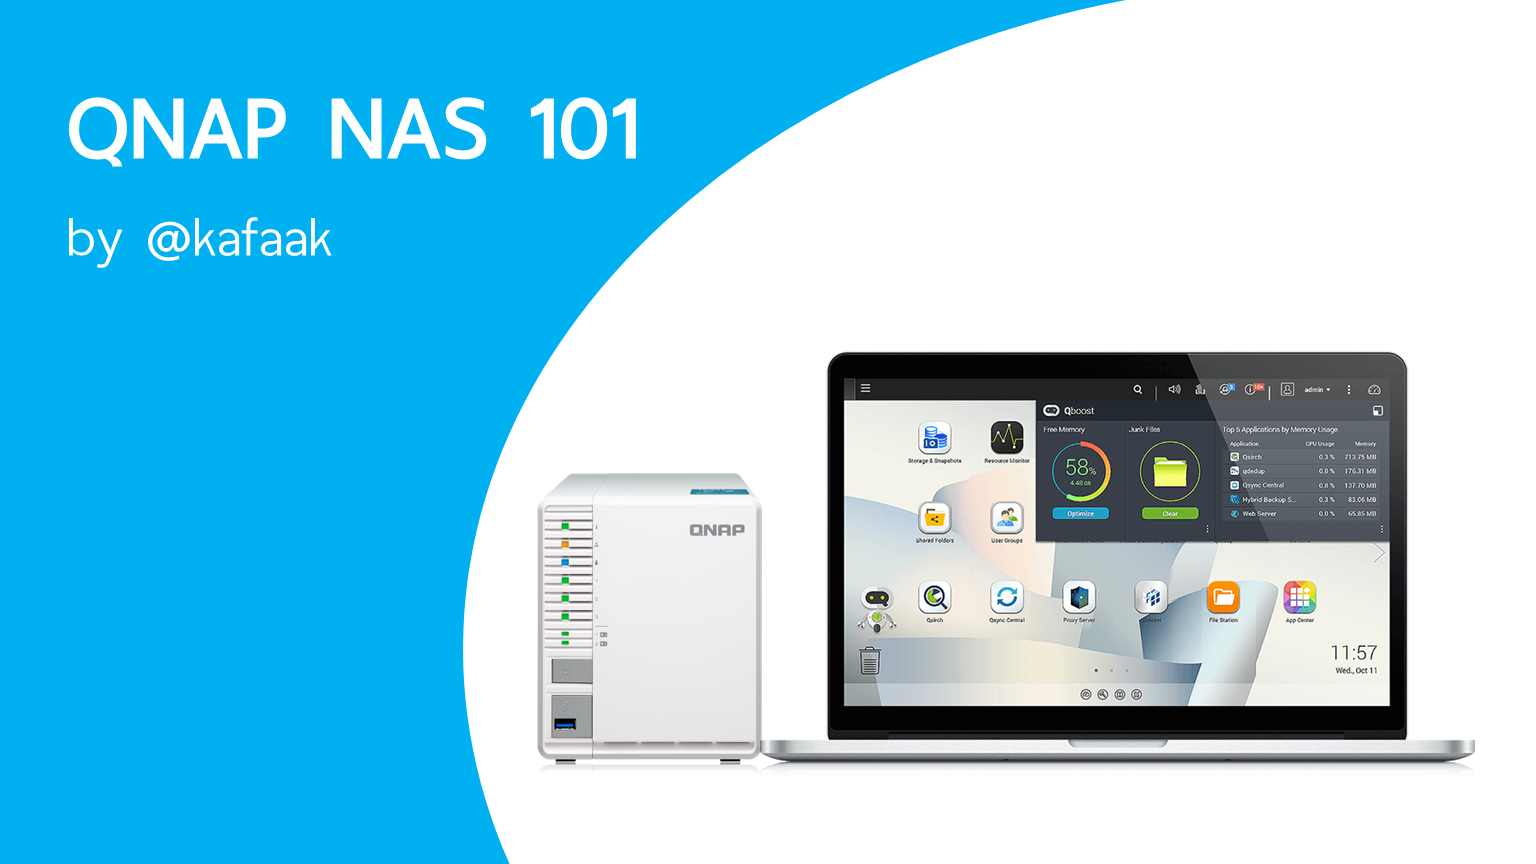 QNAP NAS 101 - EP 4: สร้างผู้ใช้งานแบบ Local user และการแก้ไขข้อมูลผู้ใช้งาน บน QNAP NAS 1